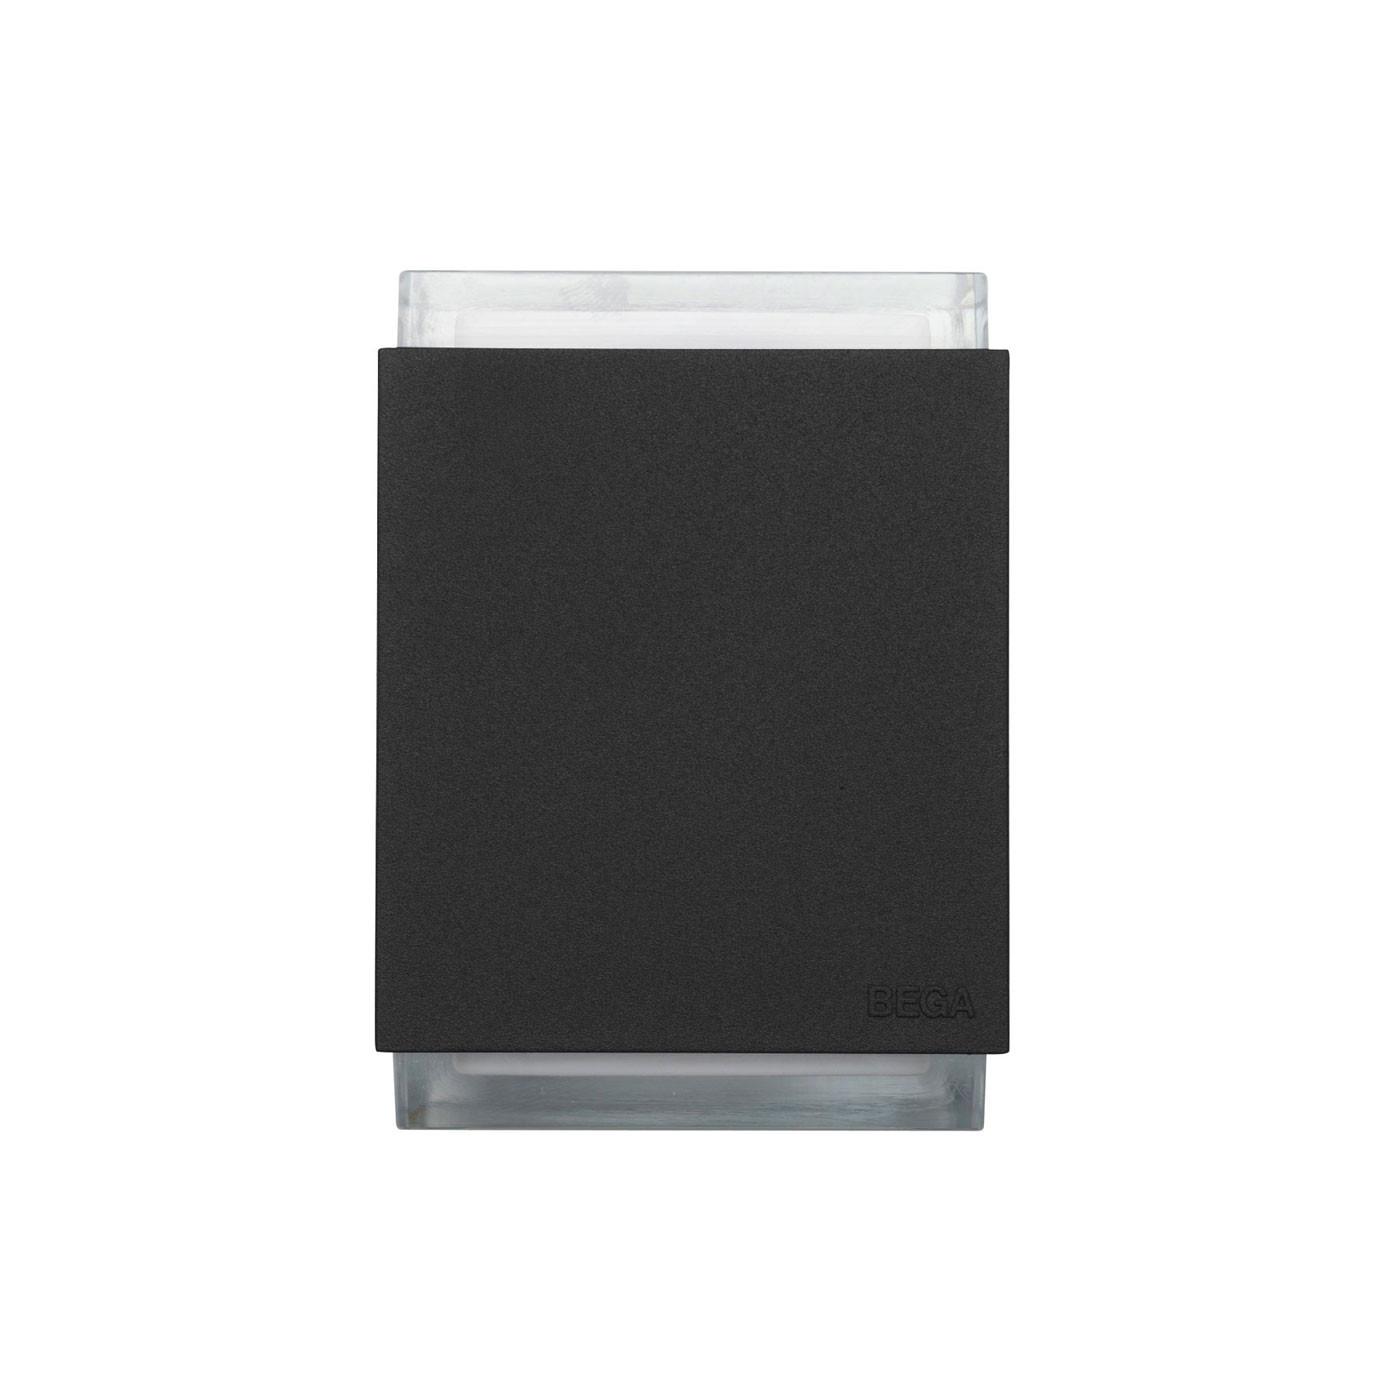 Bega 33505 LED kleine Wandleuchte, zweiseitig abstrahlend